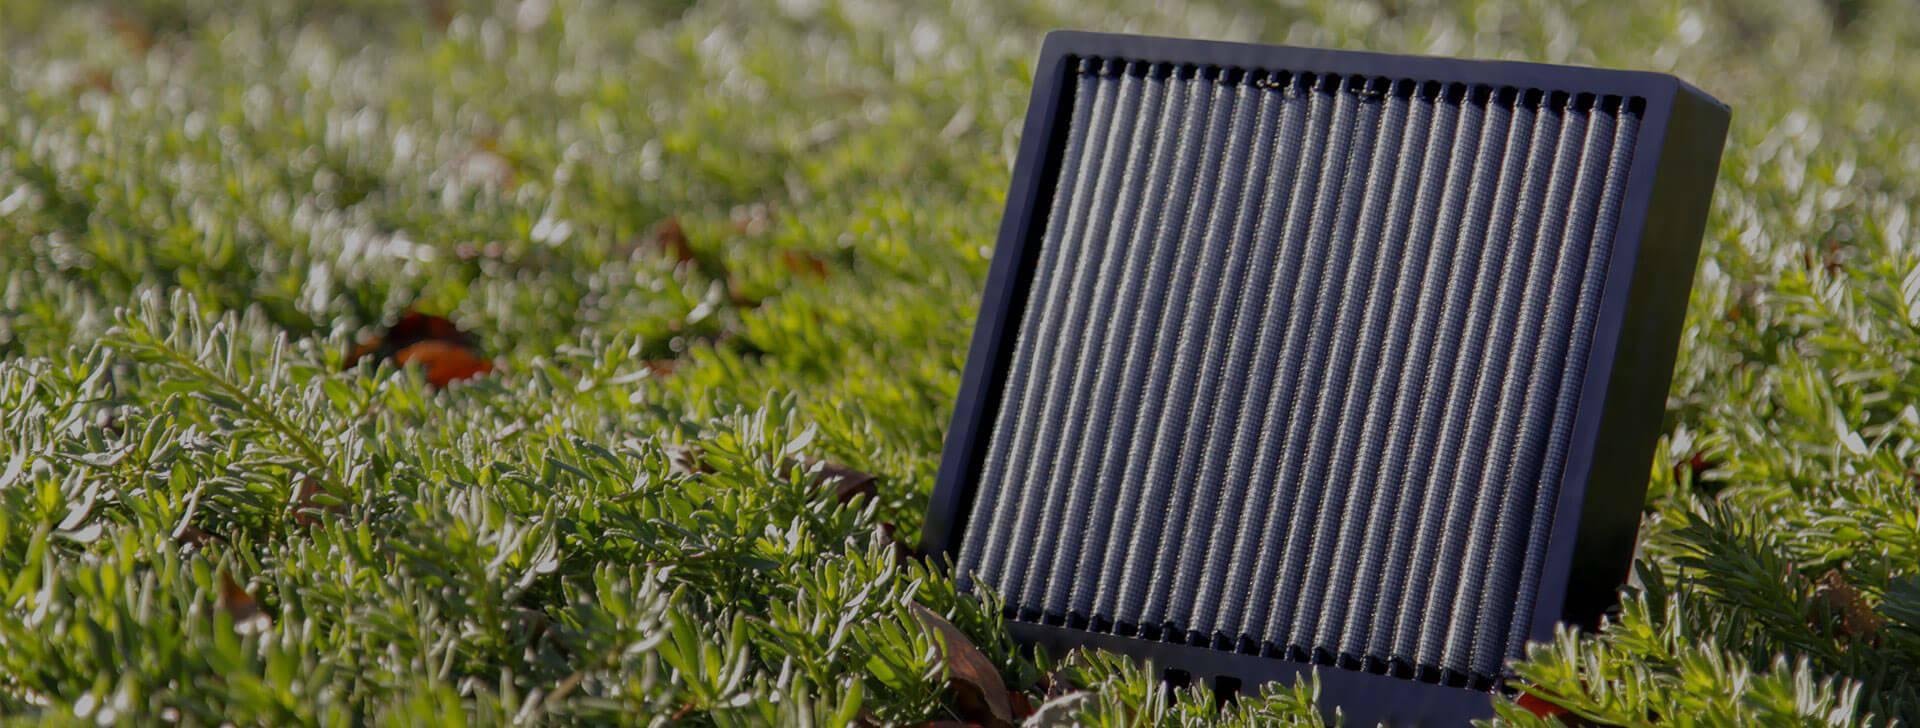 cabin air filter in grass